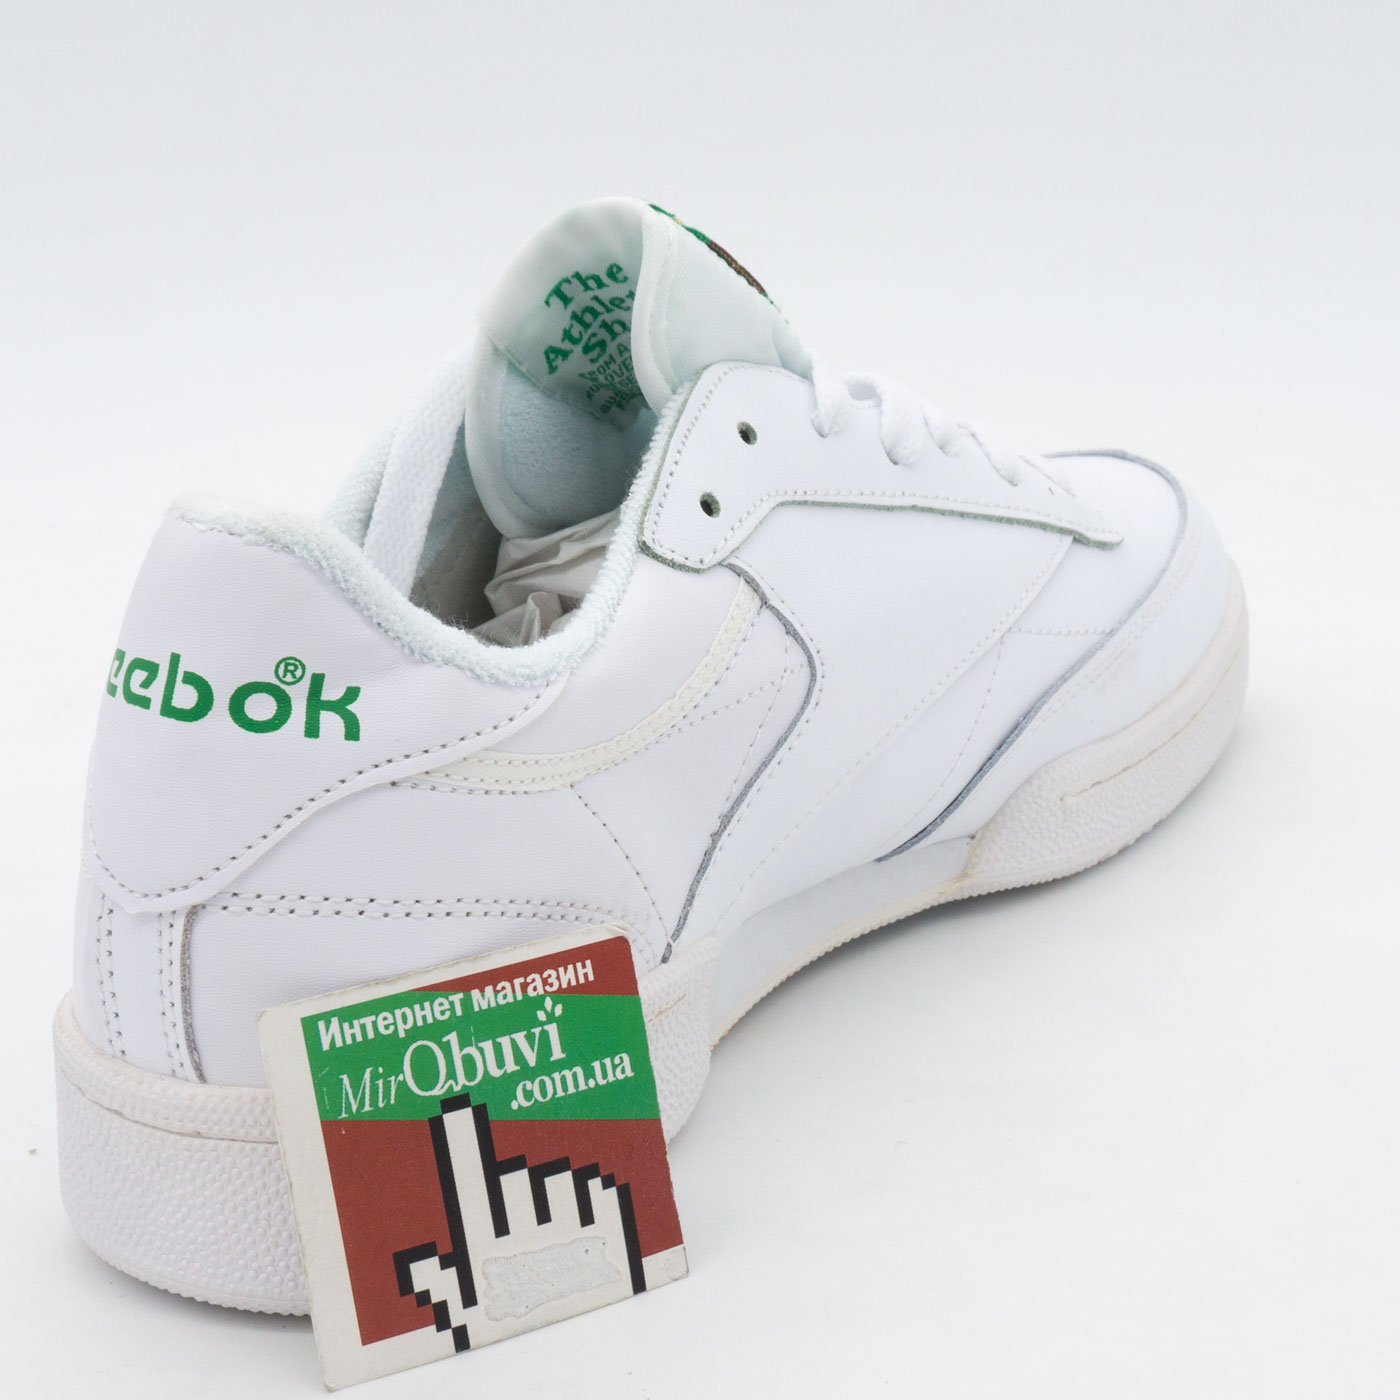 фото back Кроссовки Reebok Сlassic Club C 85 белые, натуральная кожа - Топ качество! back